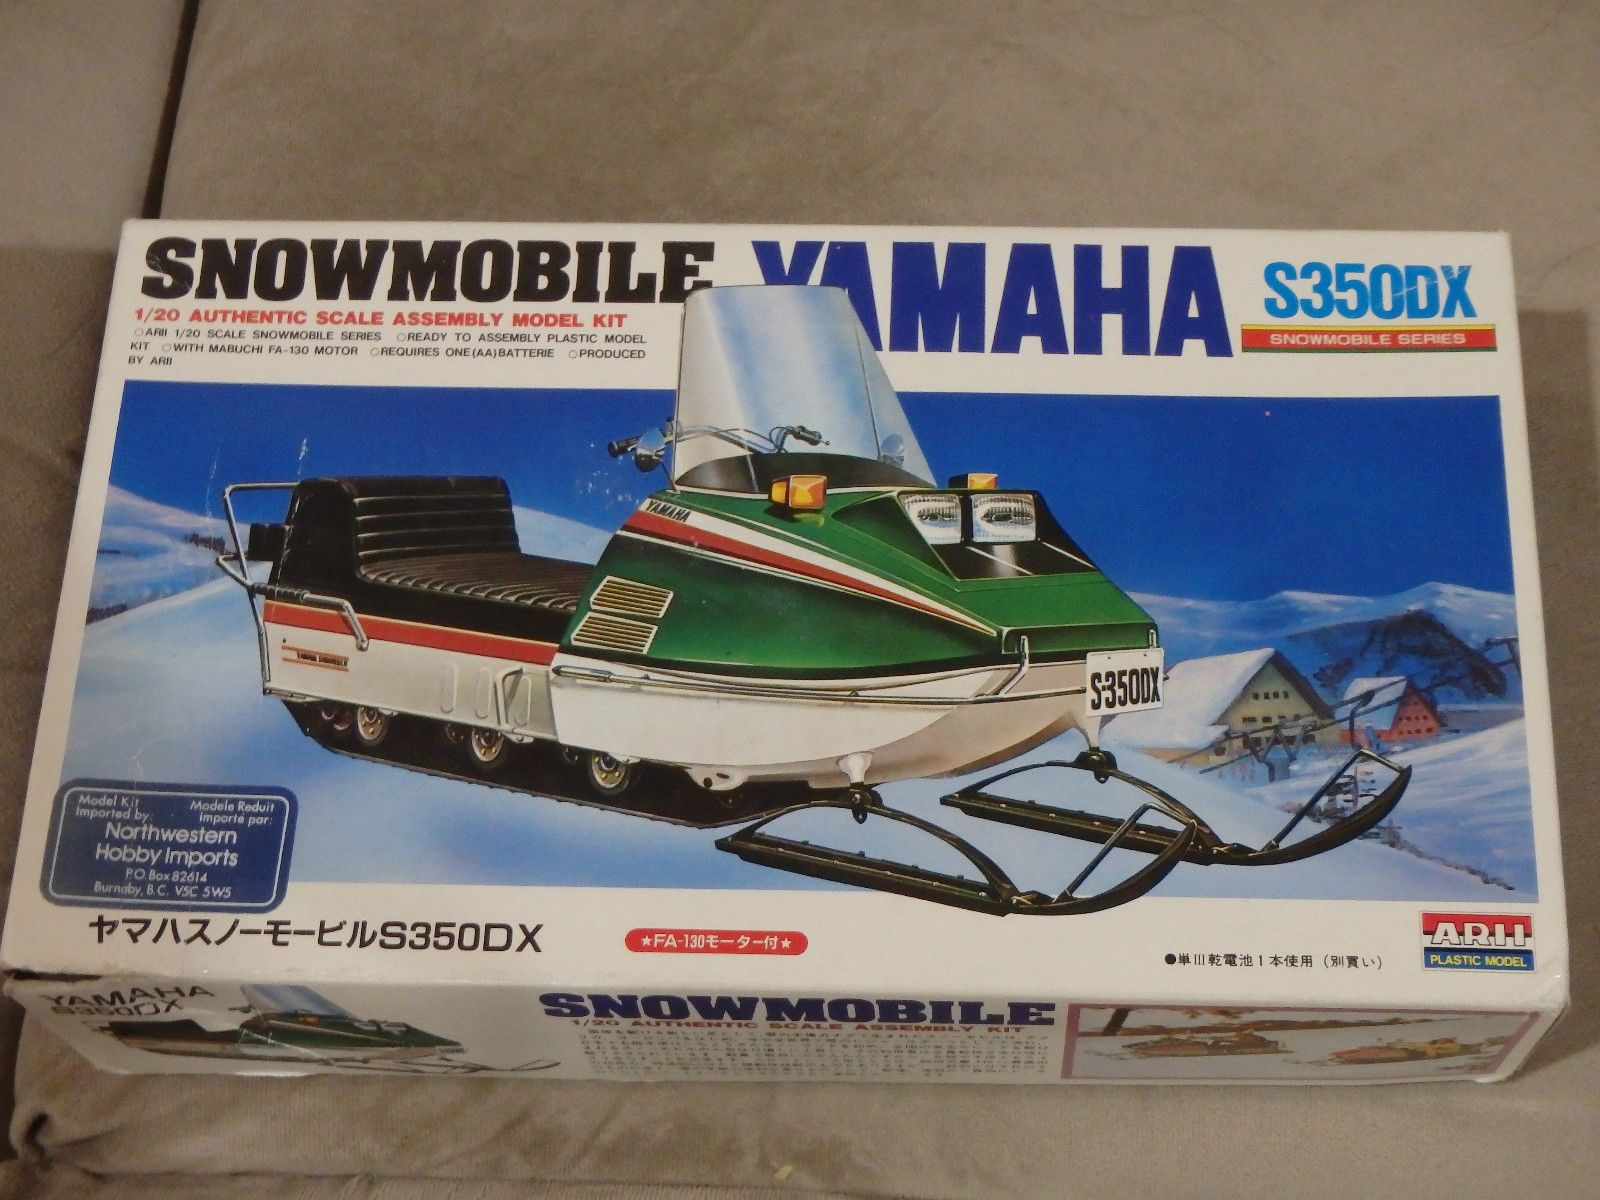 Arii 1 20 Scale Yamaha Snowmobile S350DX Plastic Model Kit